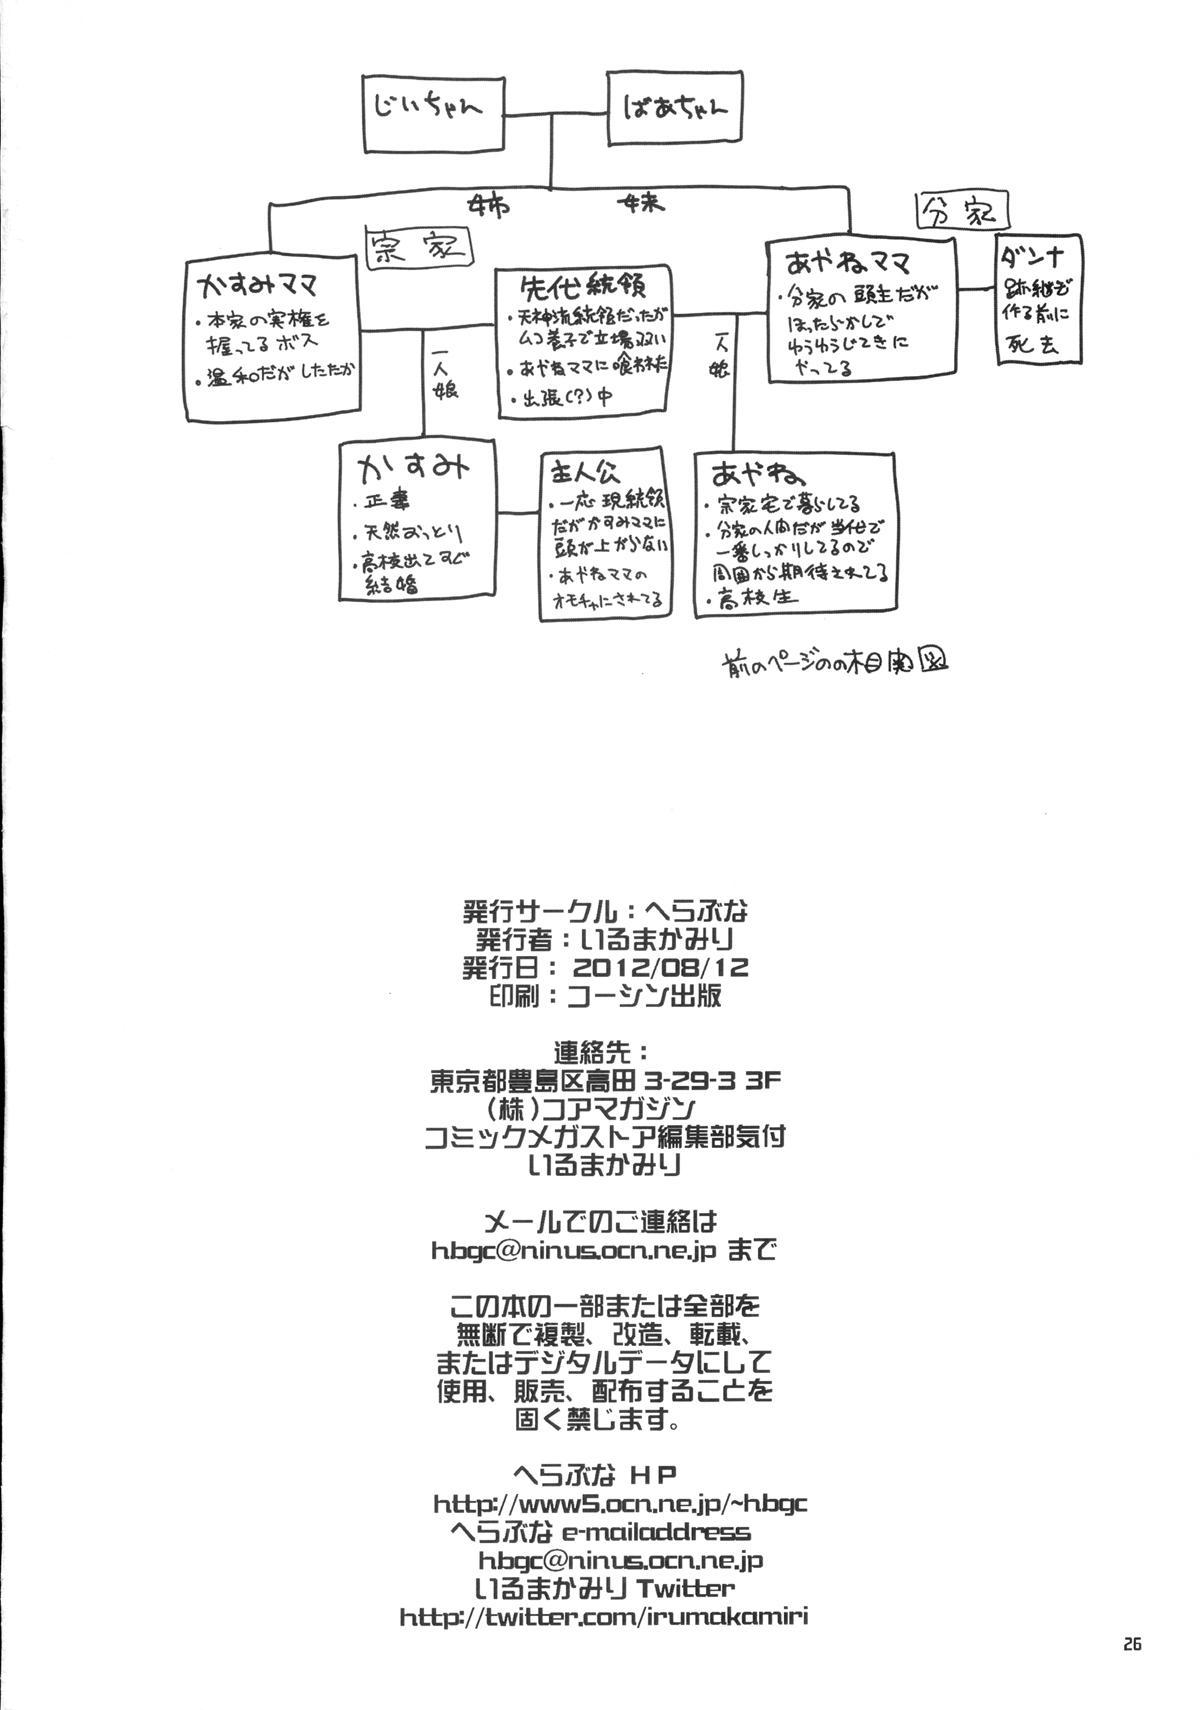 St. Dead or Alive Highschool - Love Love Kasumi Chan Teacher 23